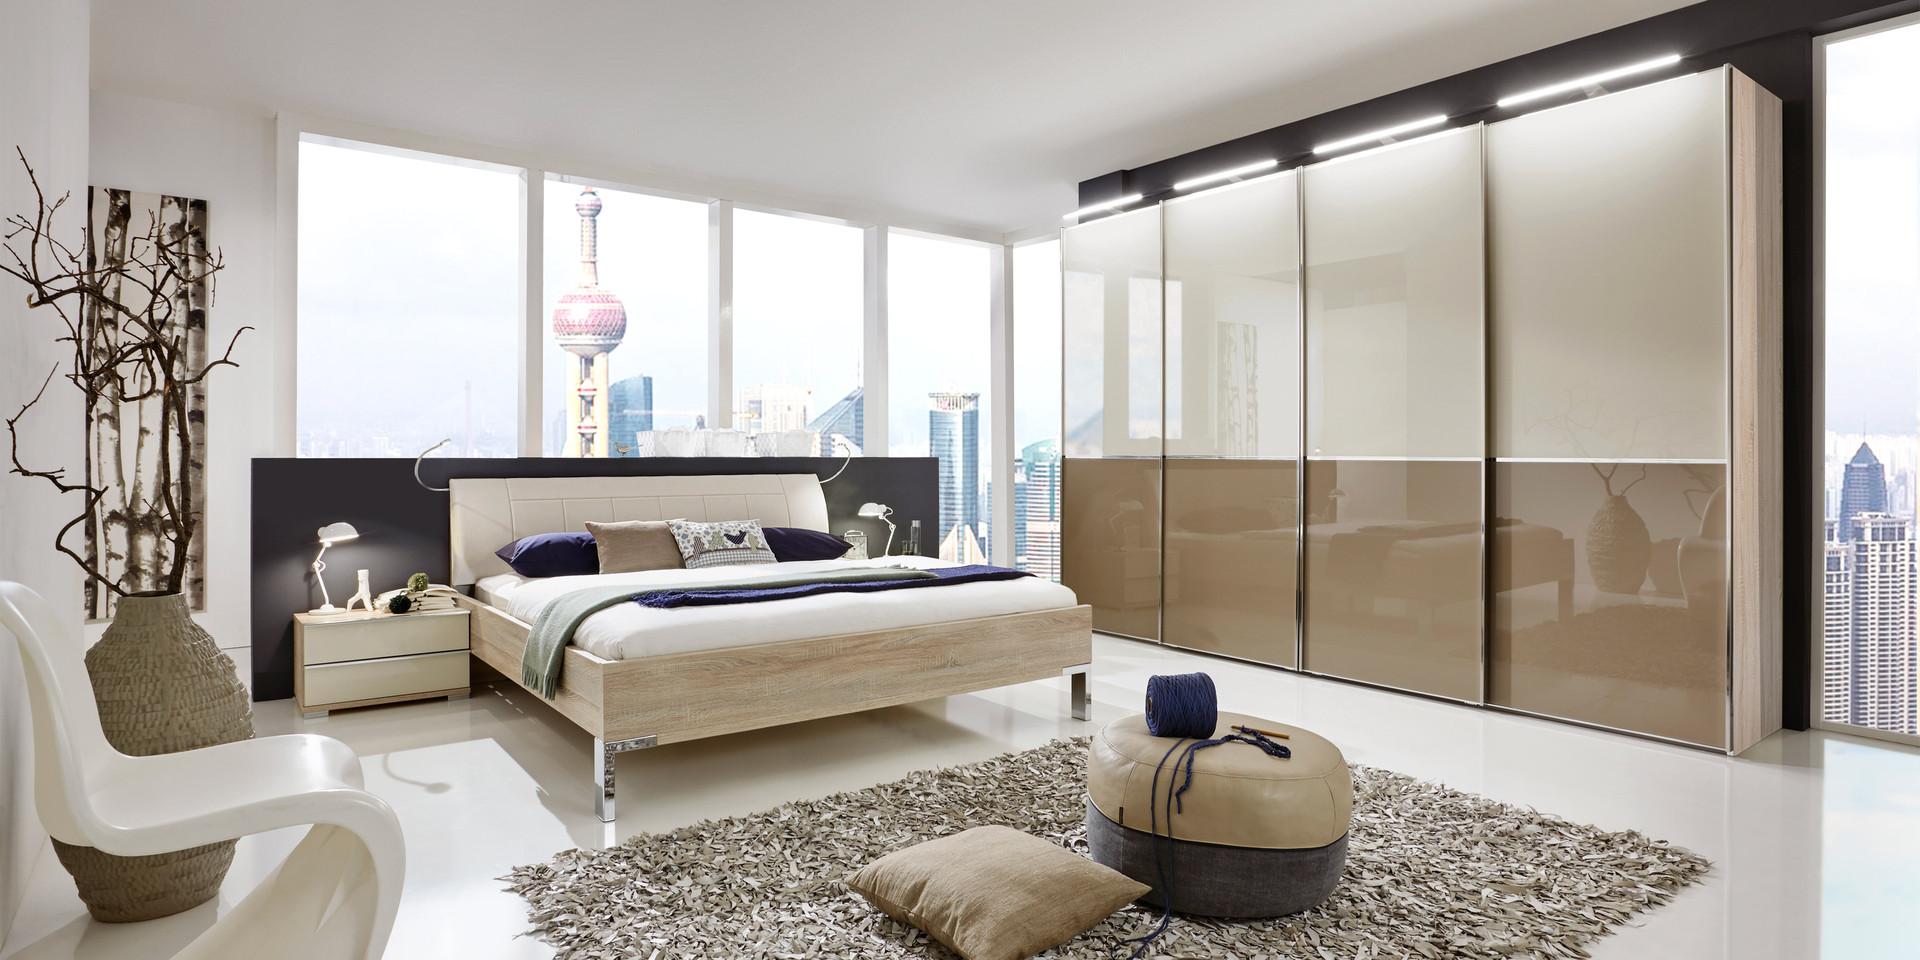 Chambre A Coucher Chambre A Coucher Ikea Moderne